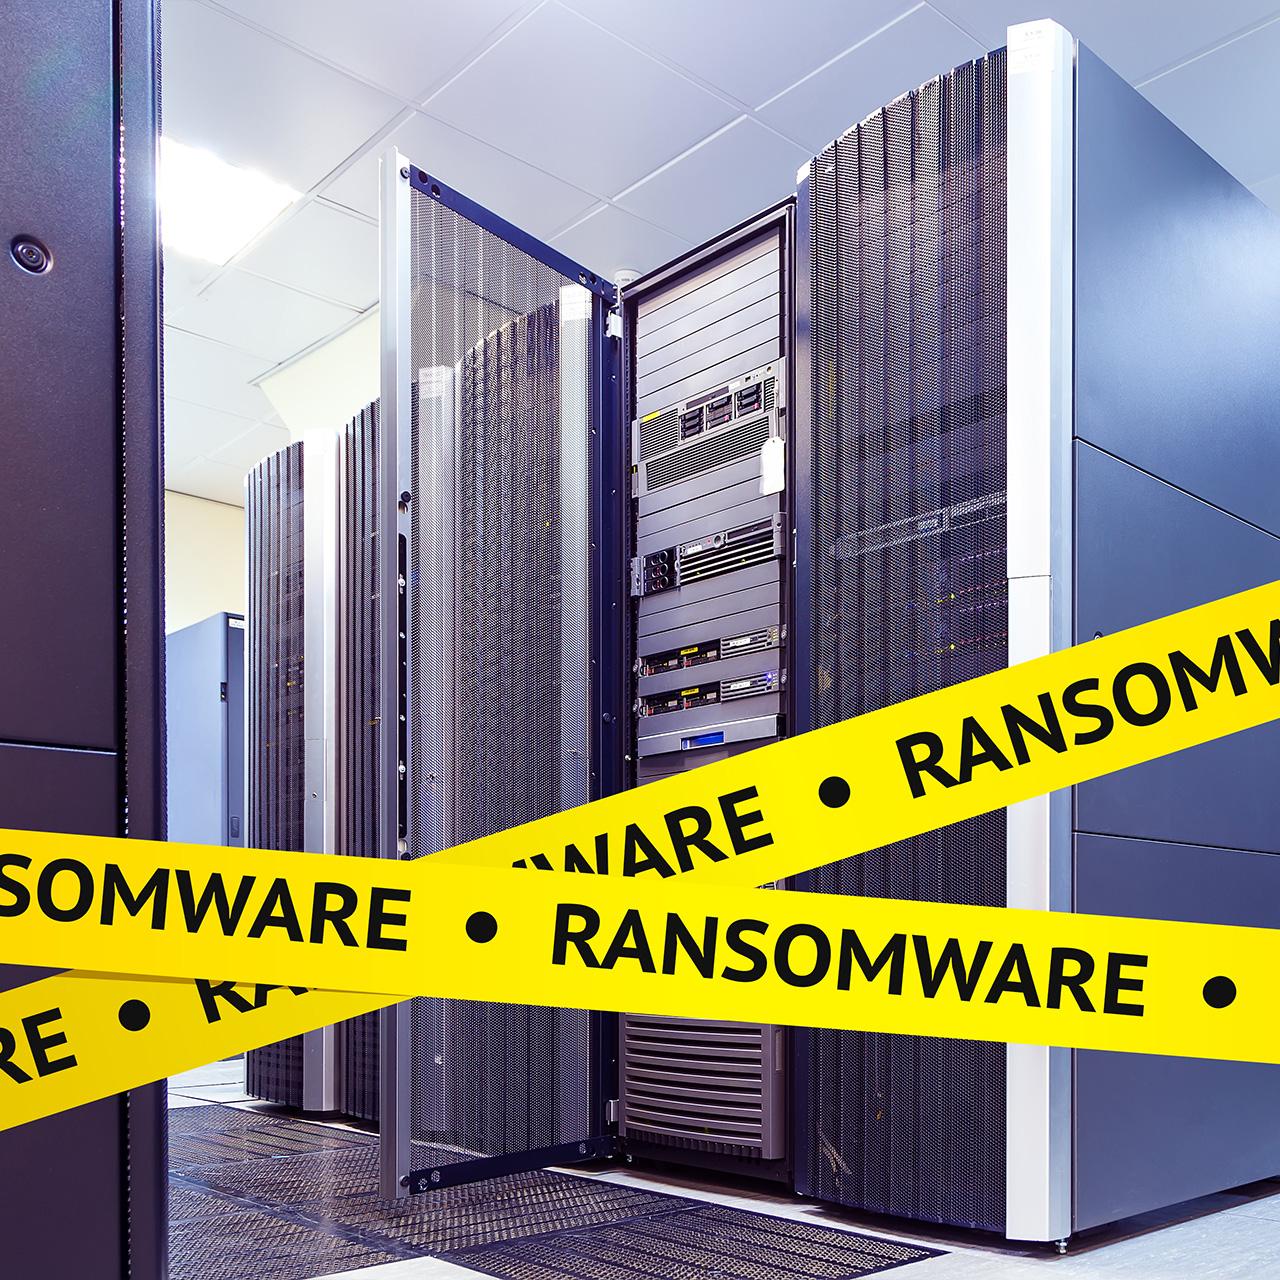 CTB-Locker ransomware infects 70 web servers